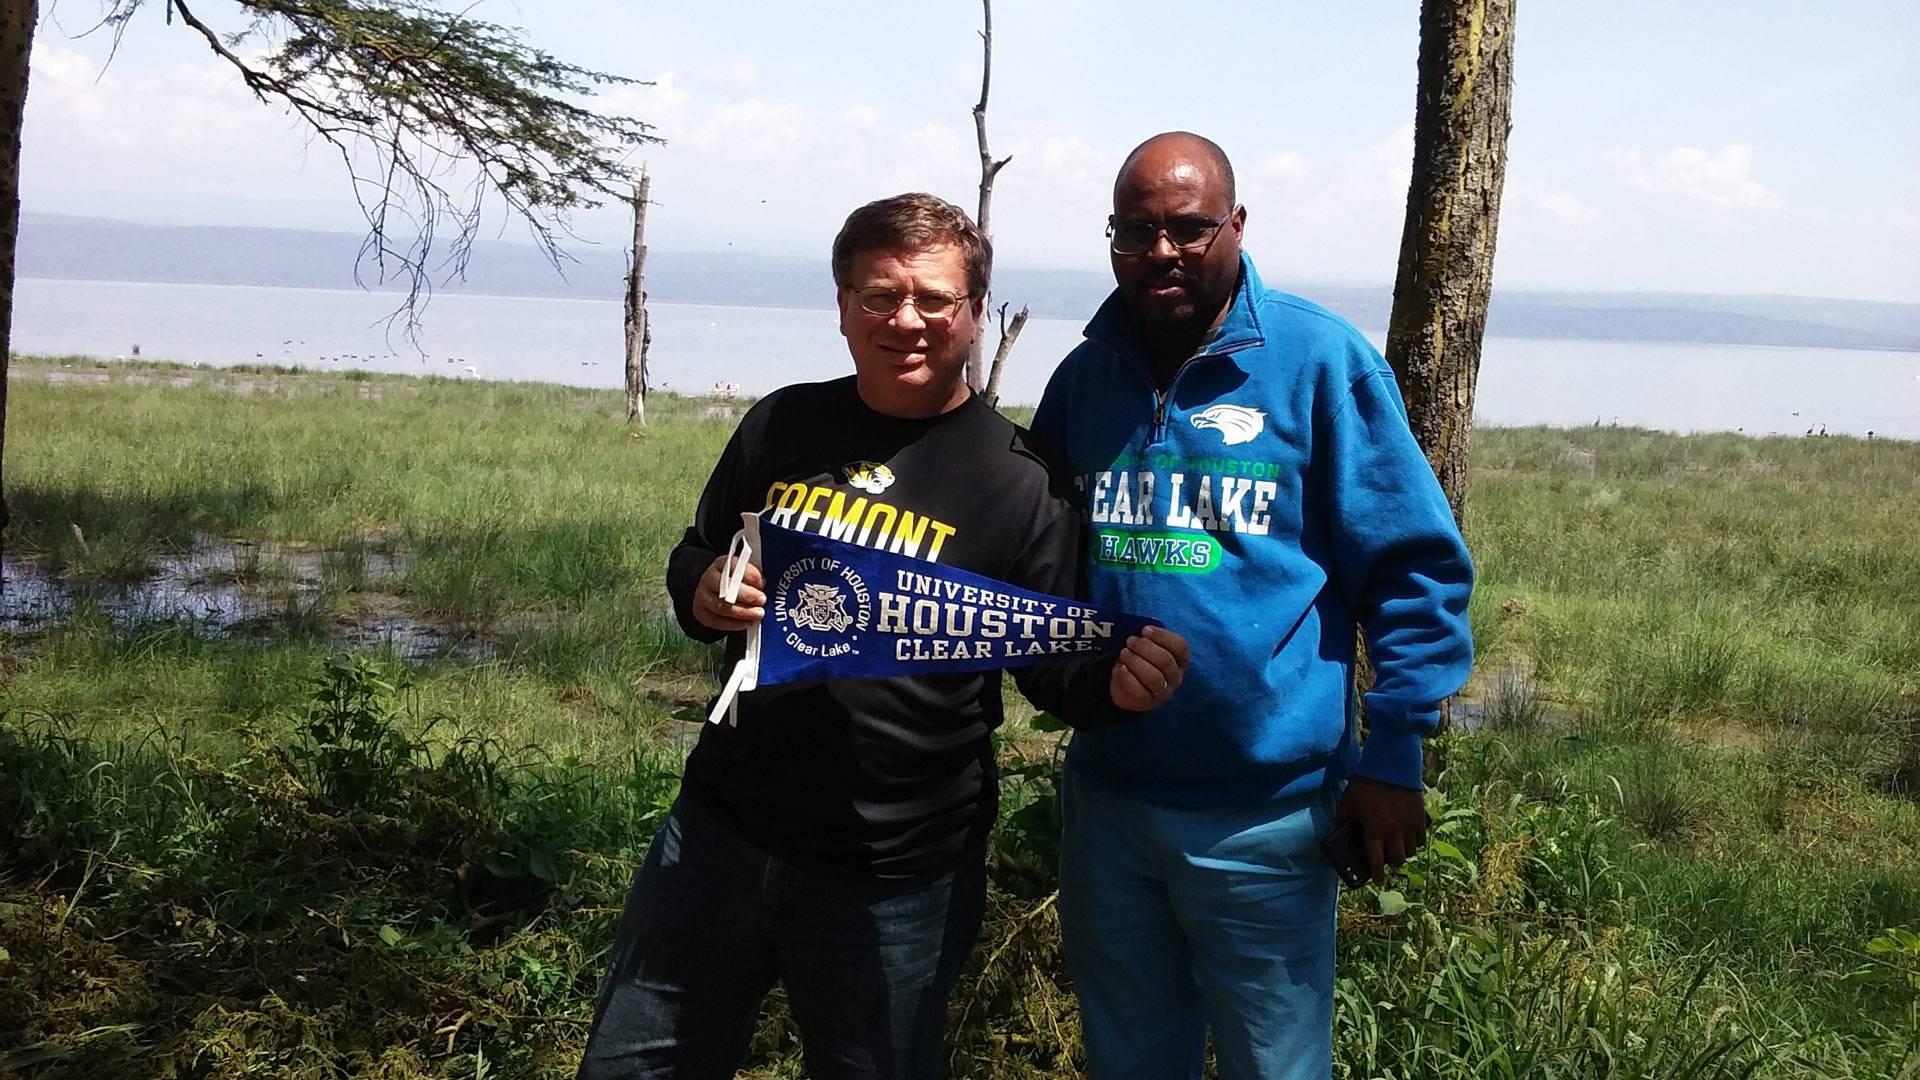 Blog: UHCL profs' research trip to Kenyan university culminates in visit to national park